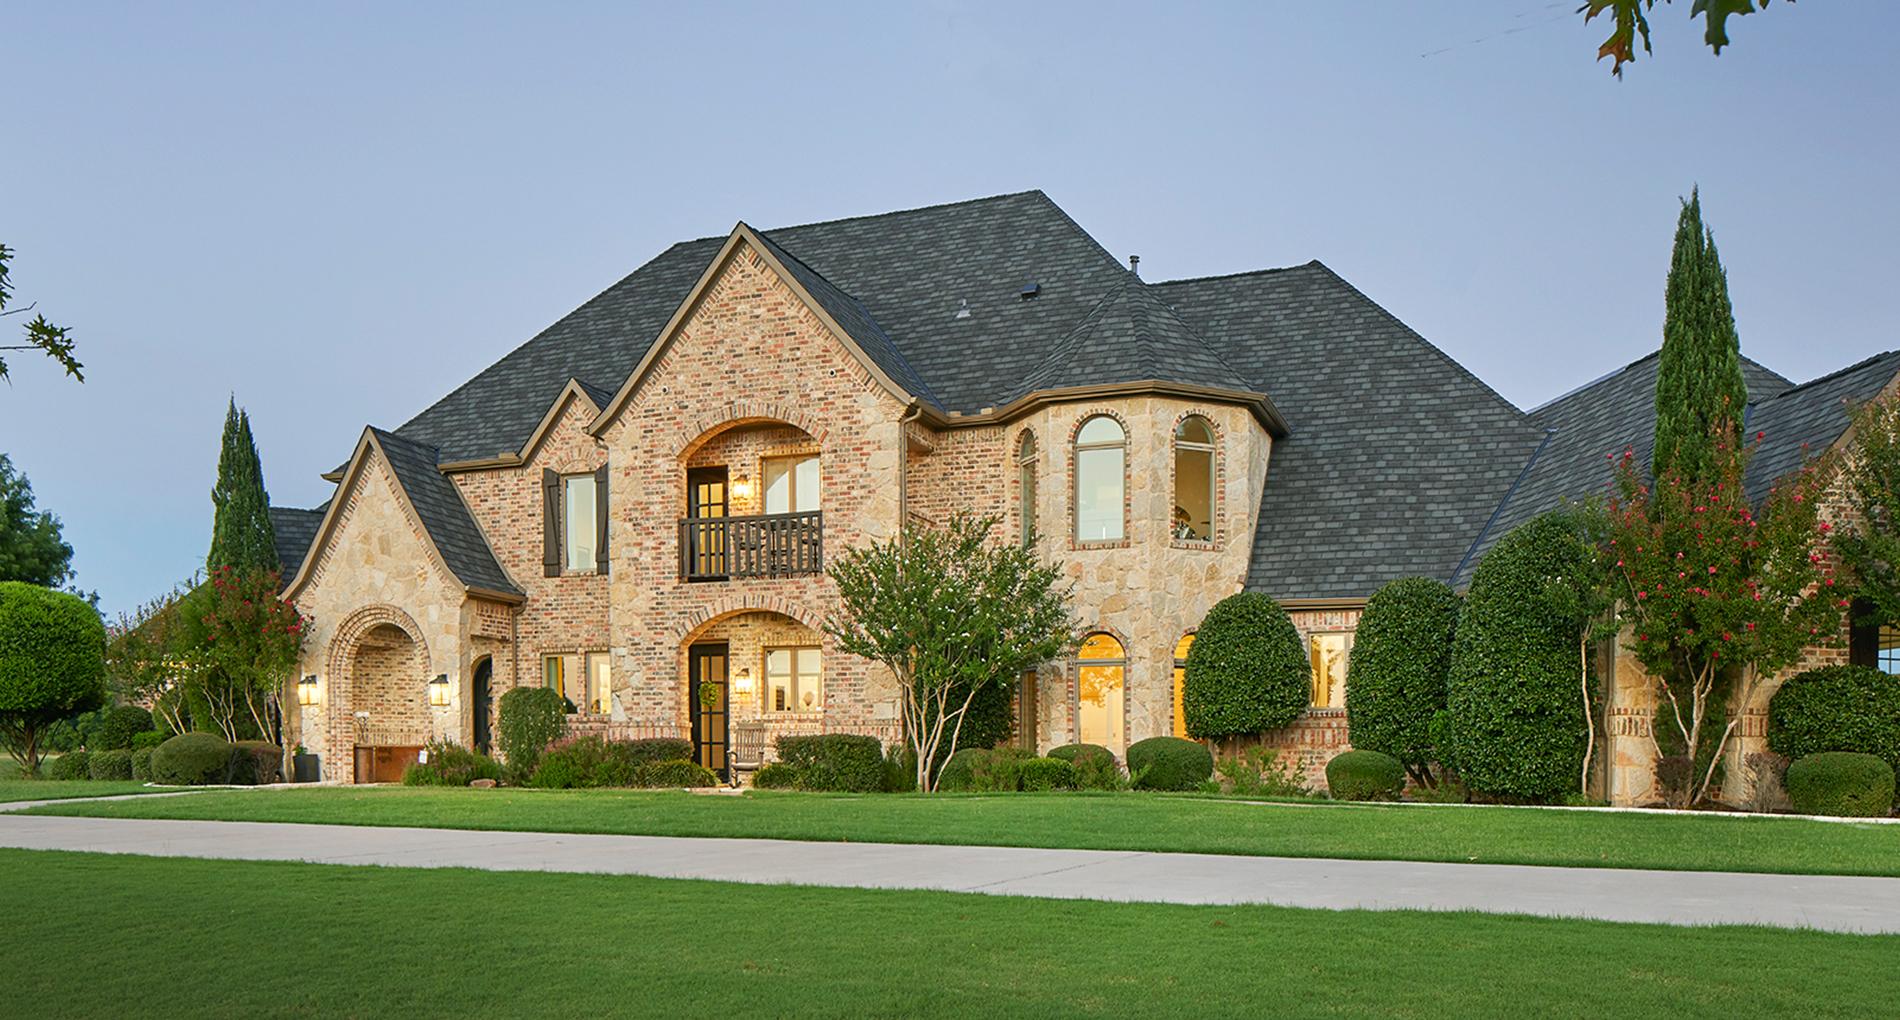 dallas-harvest-ridge-whole-house-remodel-2